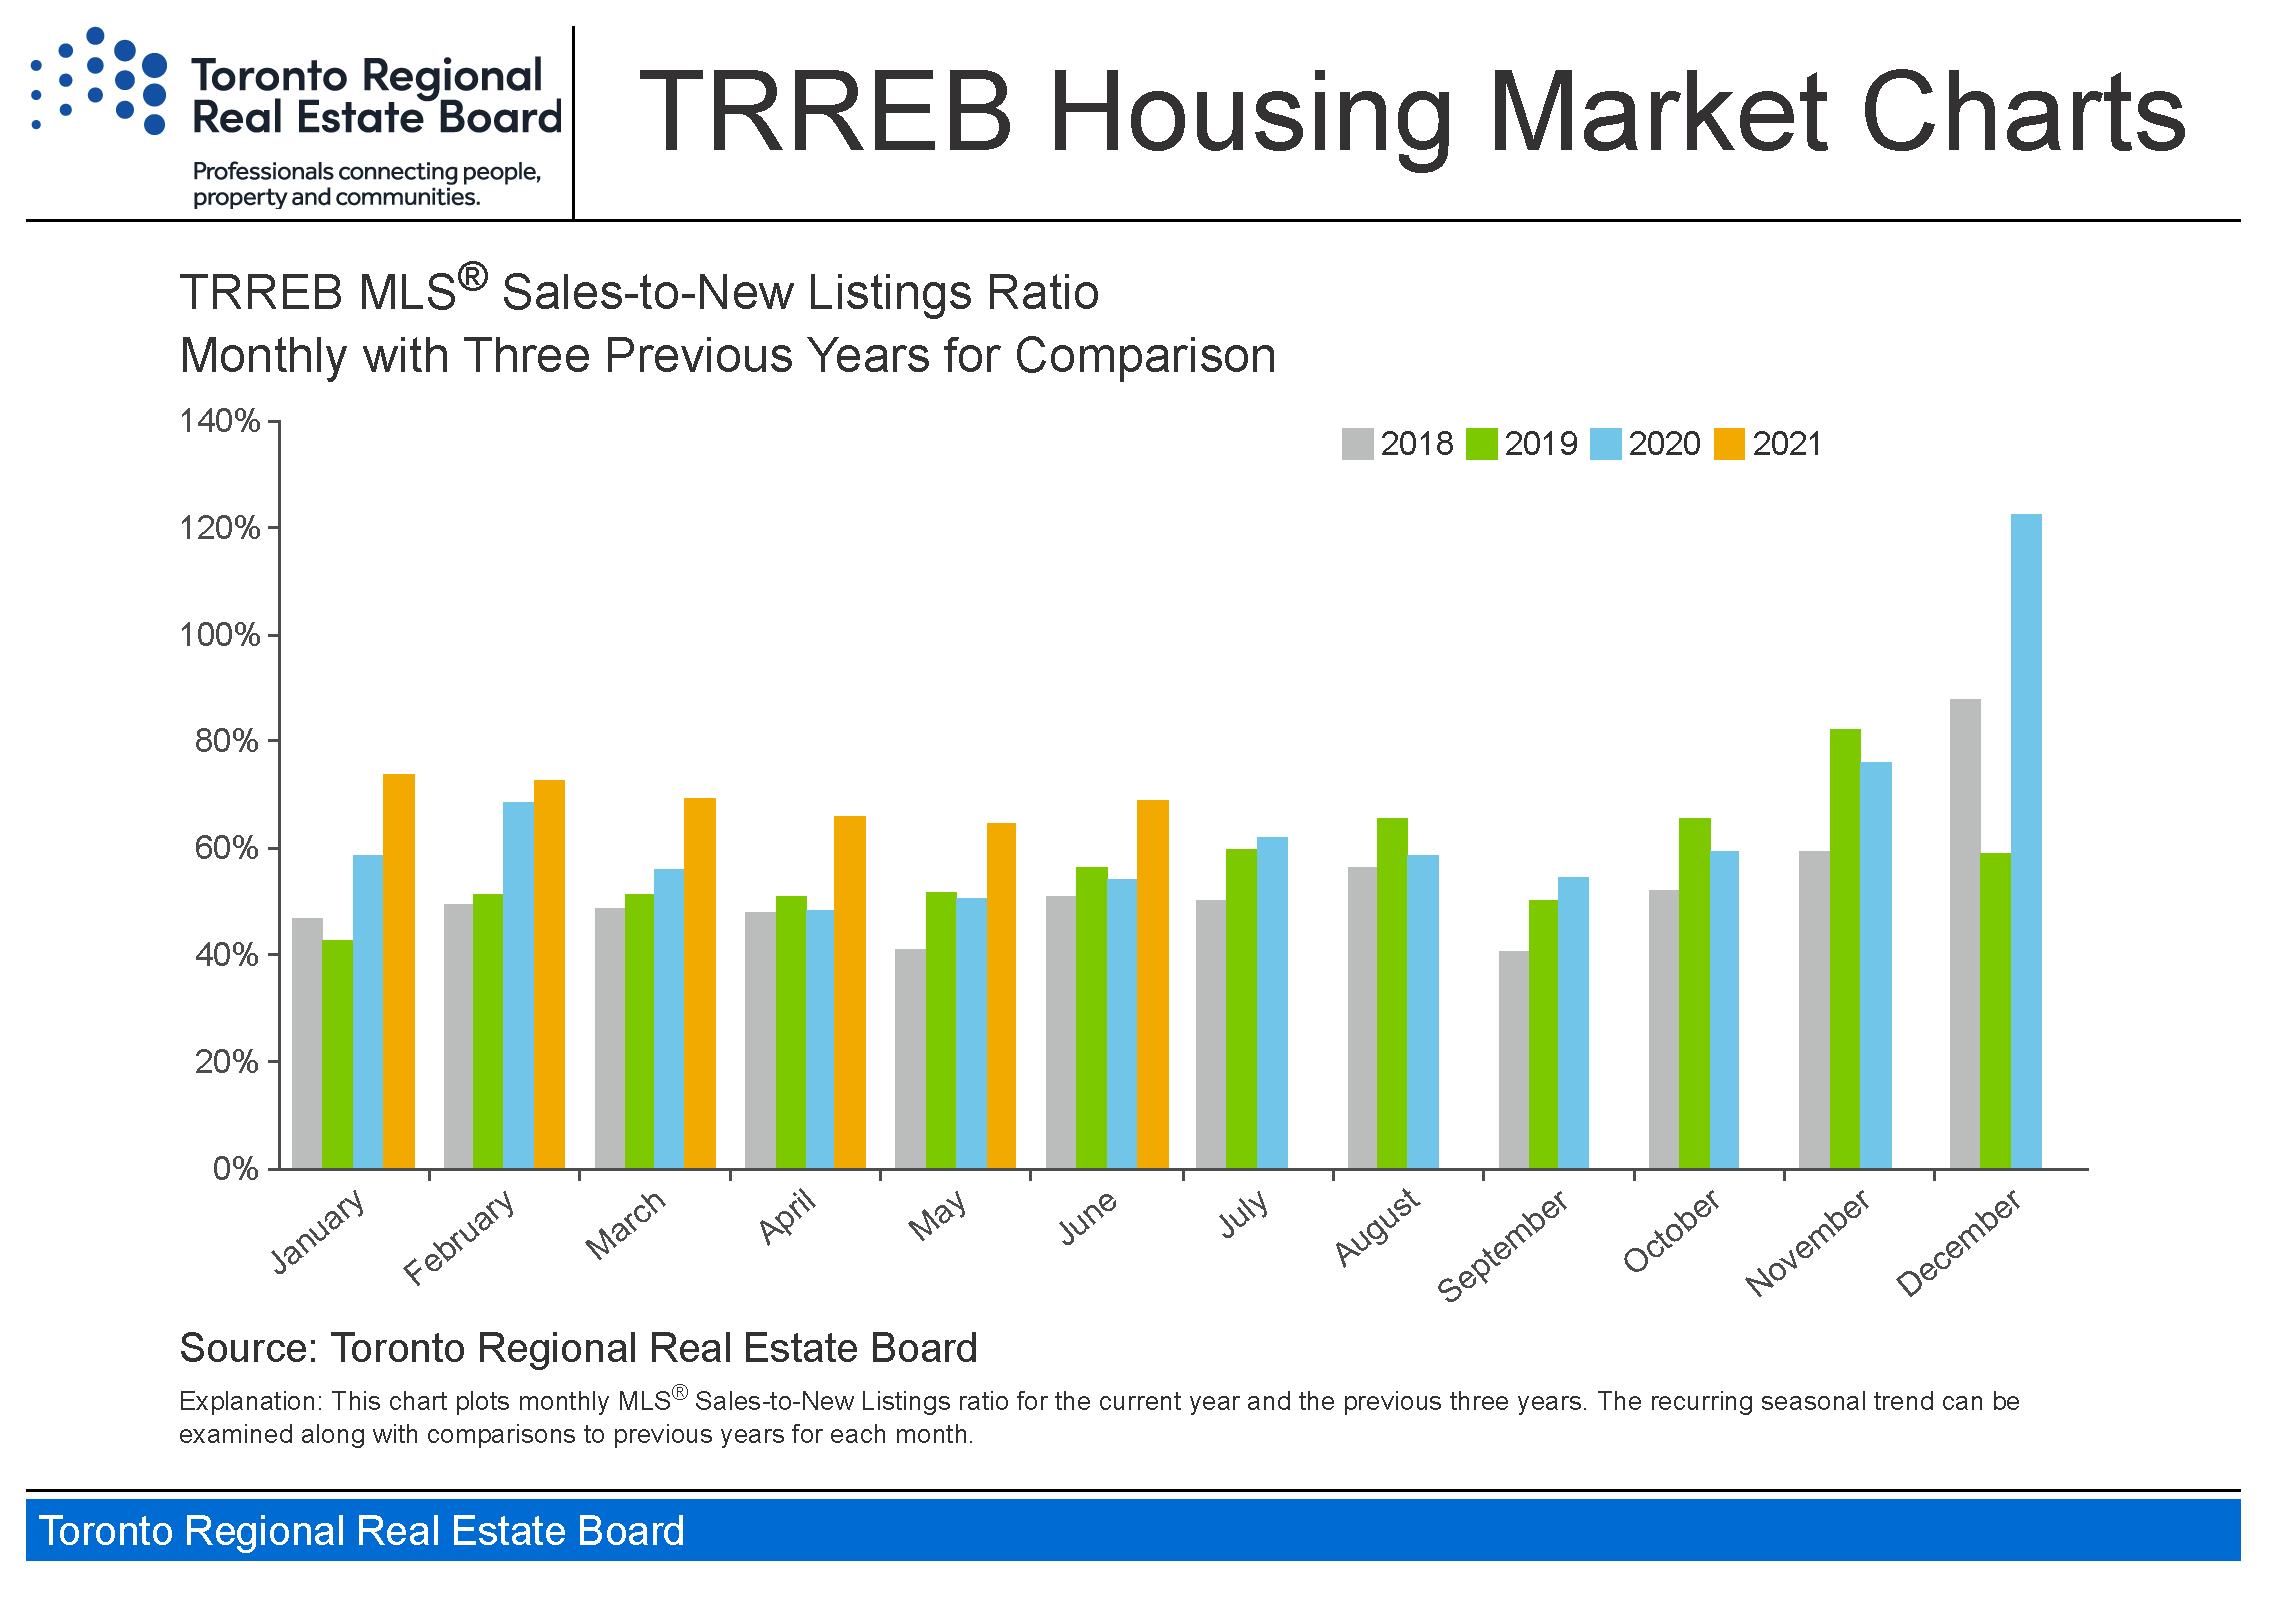 Toronto_housing-charts_TREB_Housing_Market_Charts-June_2021_Page_4